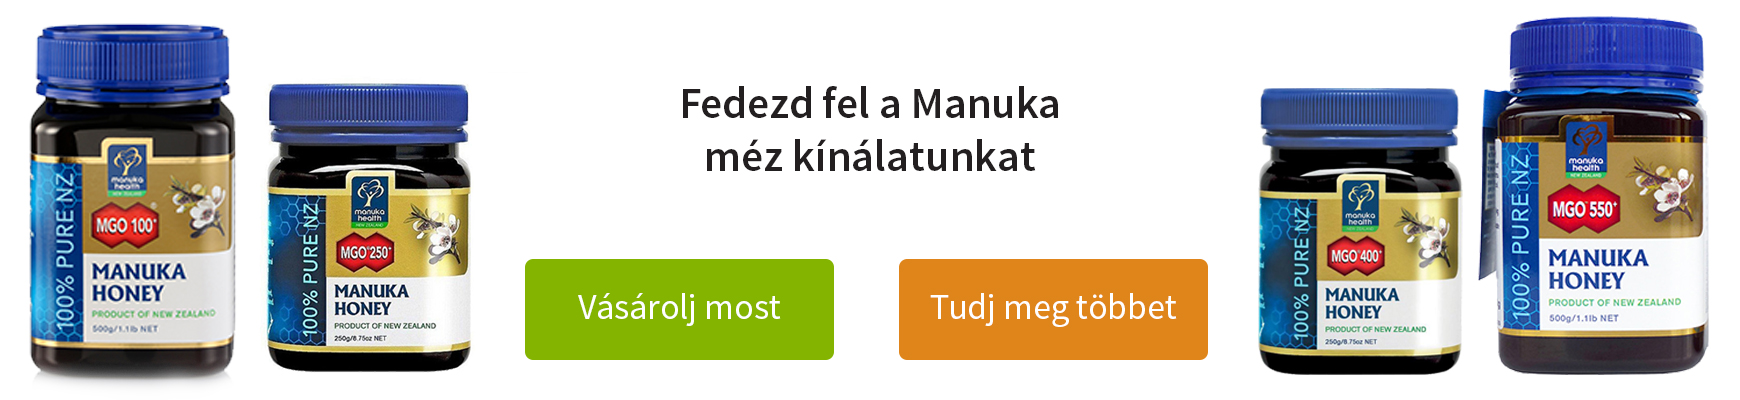 Manuka mez